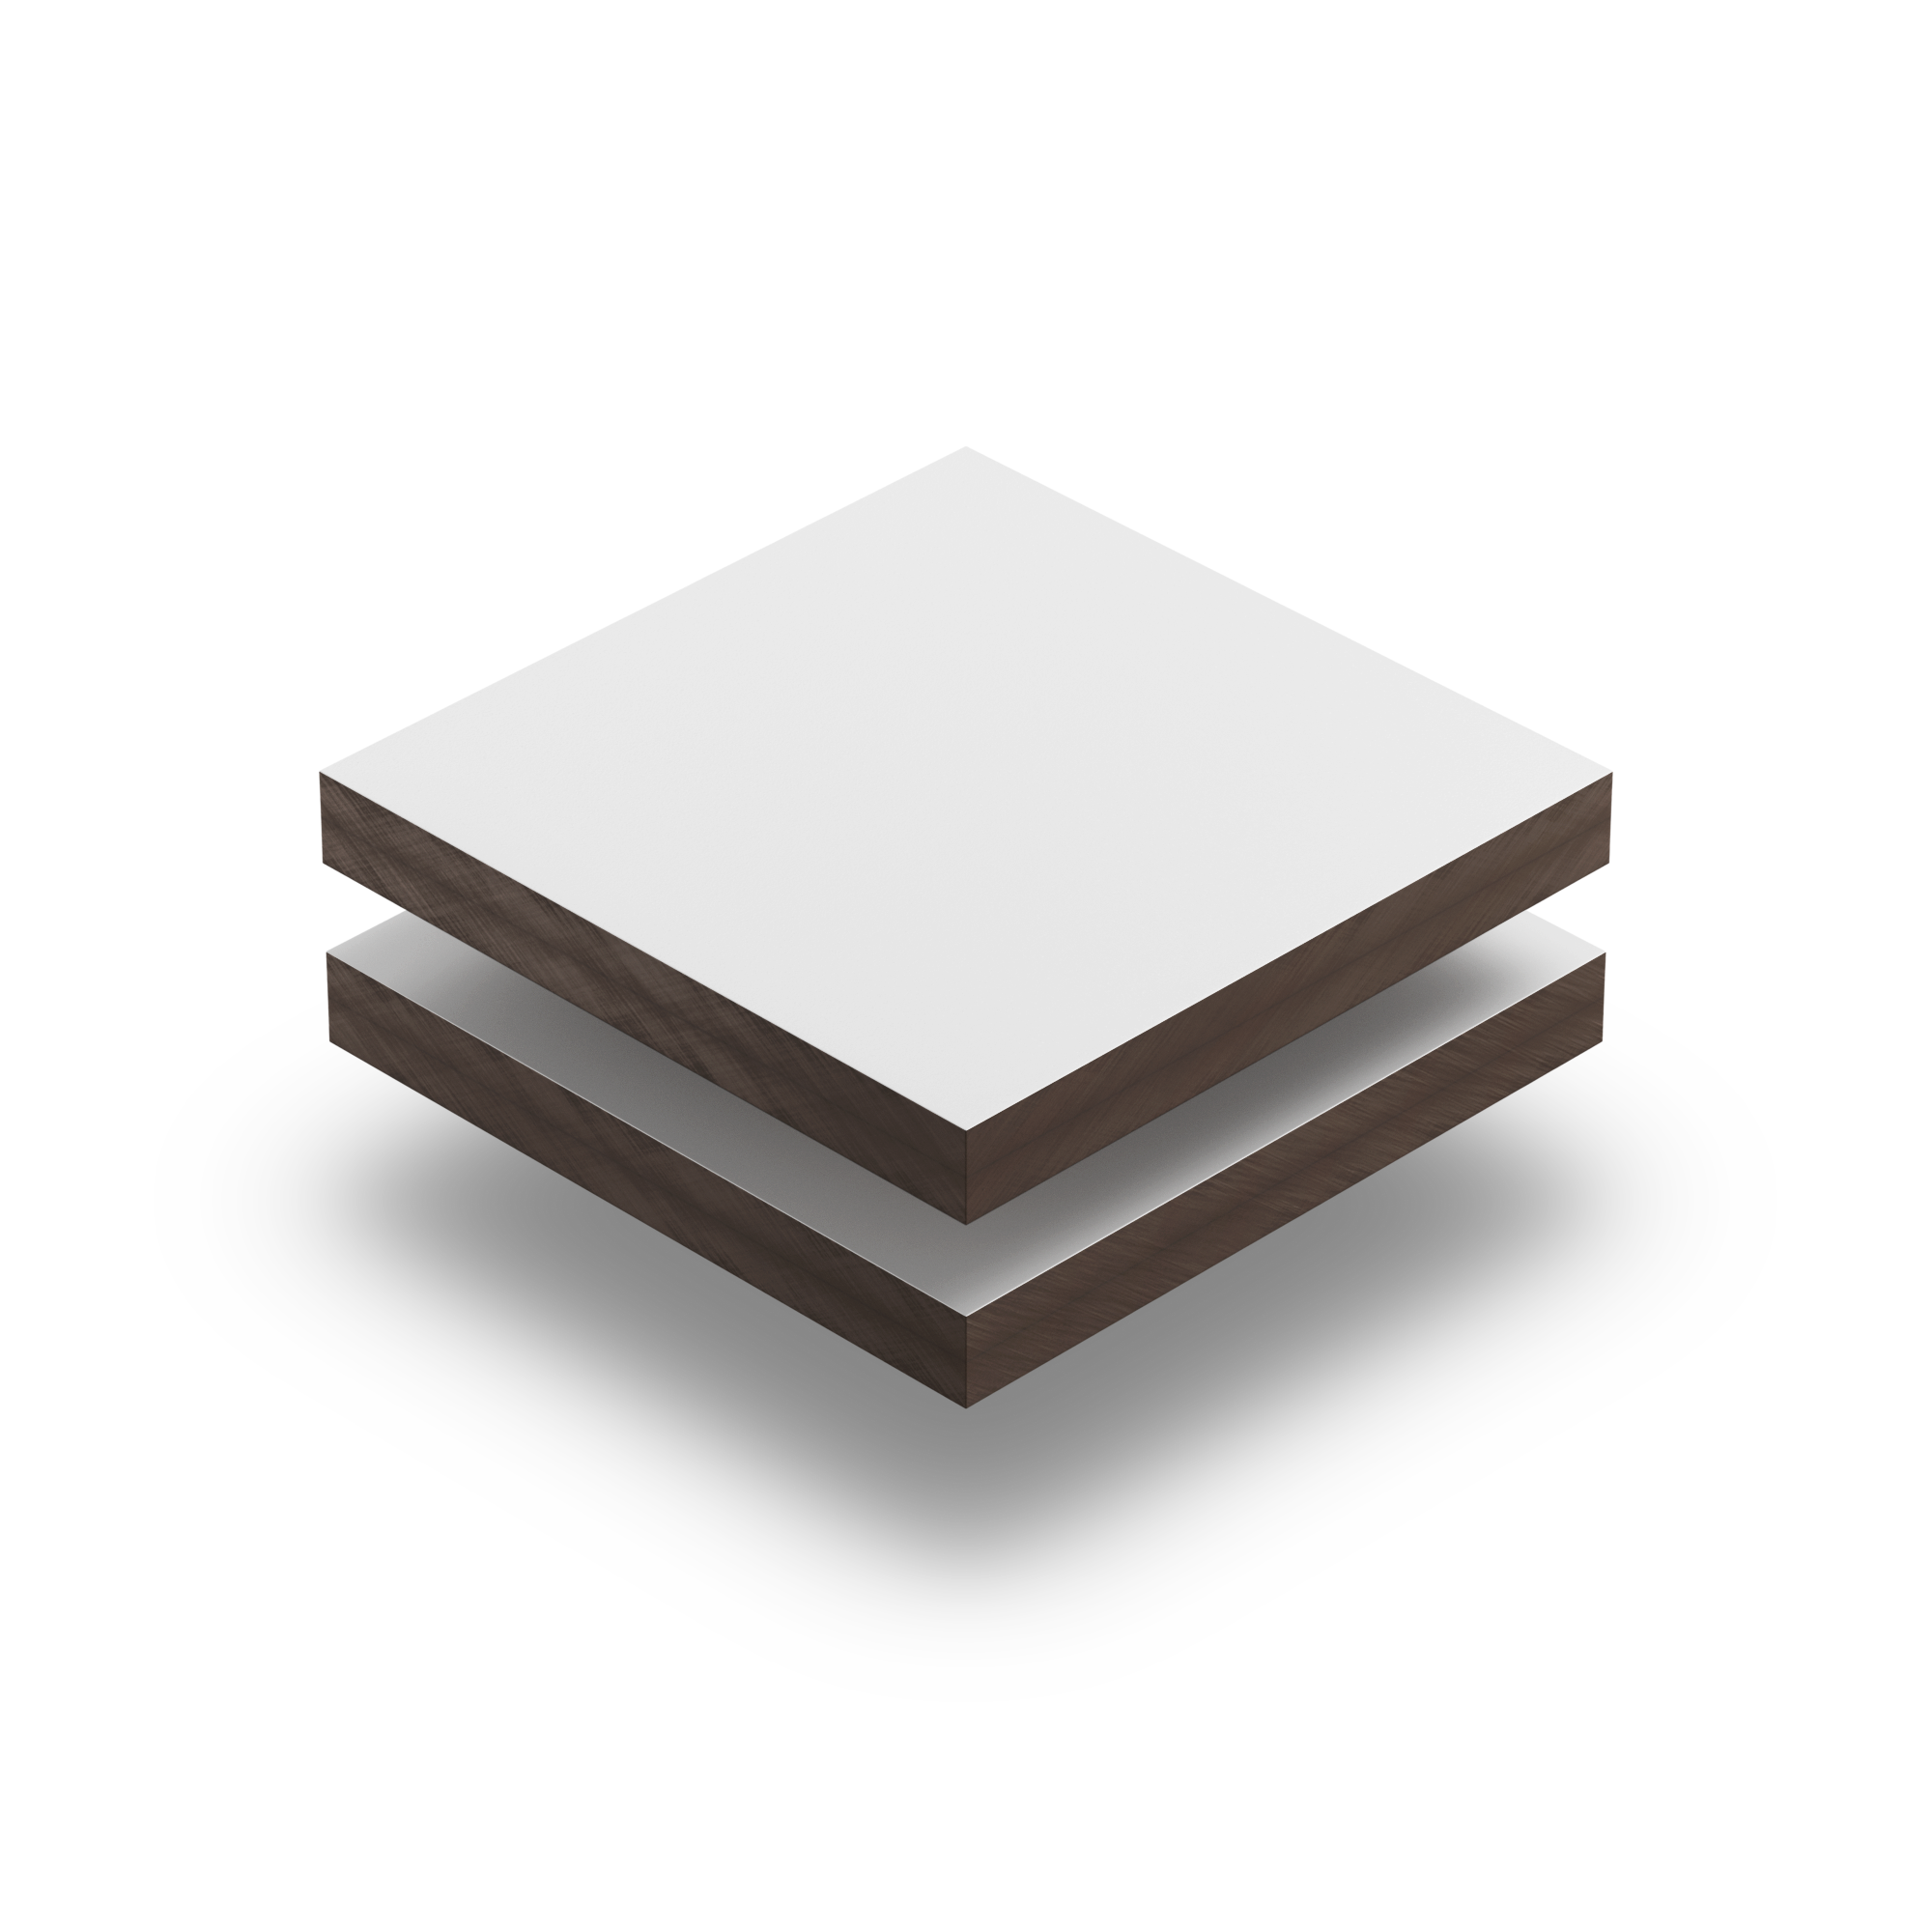 White Hpl Sheet 6 Mm Plasticsheetsshop Co Uk